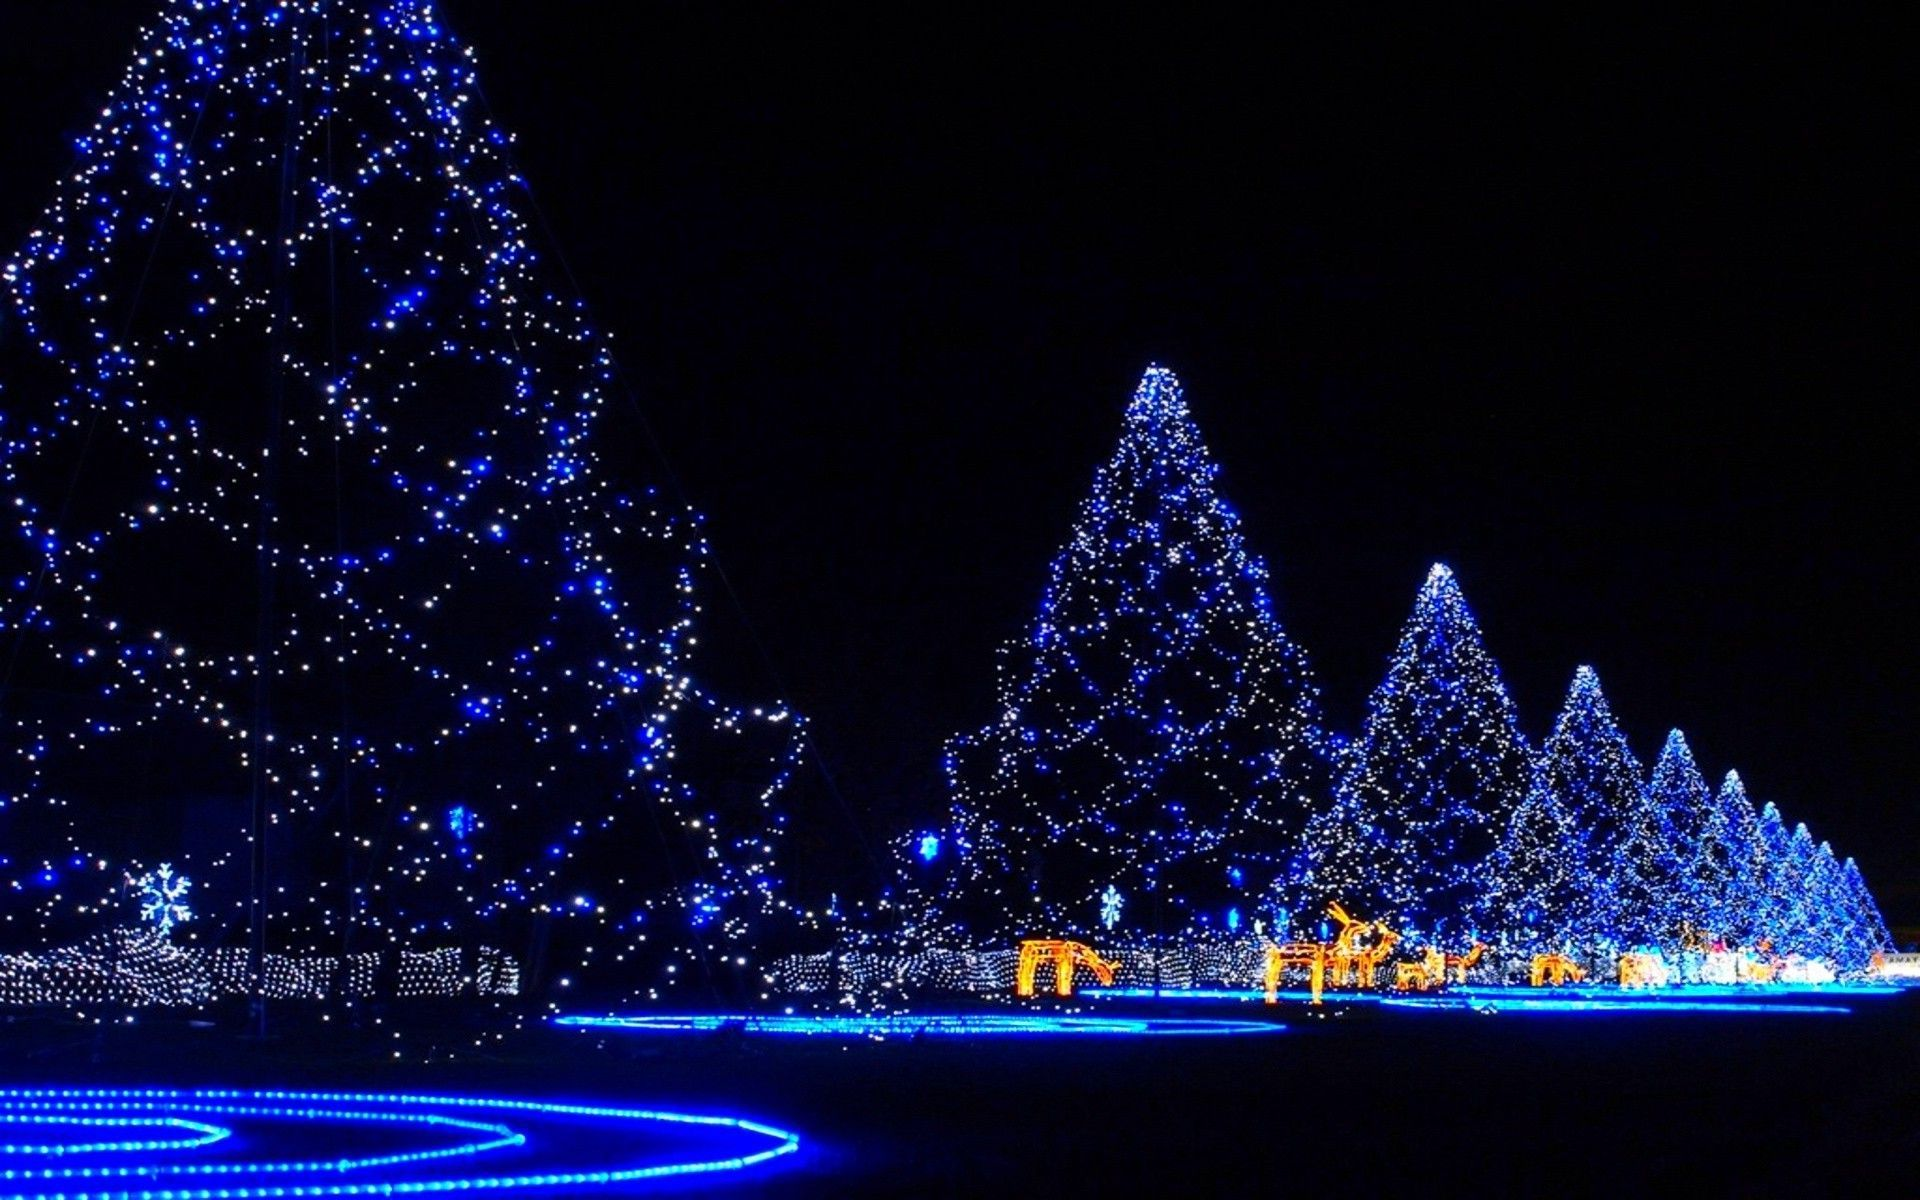 Christmas Lights Backgrounds 1920x1200